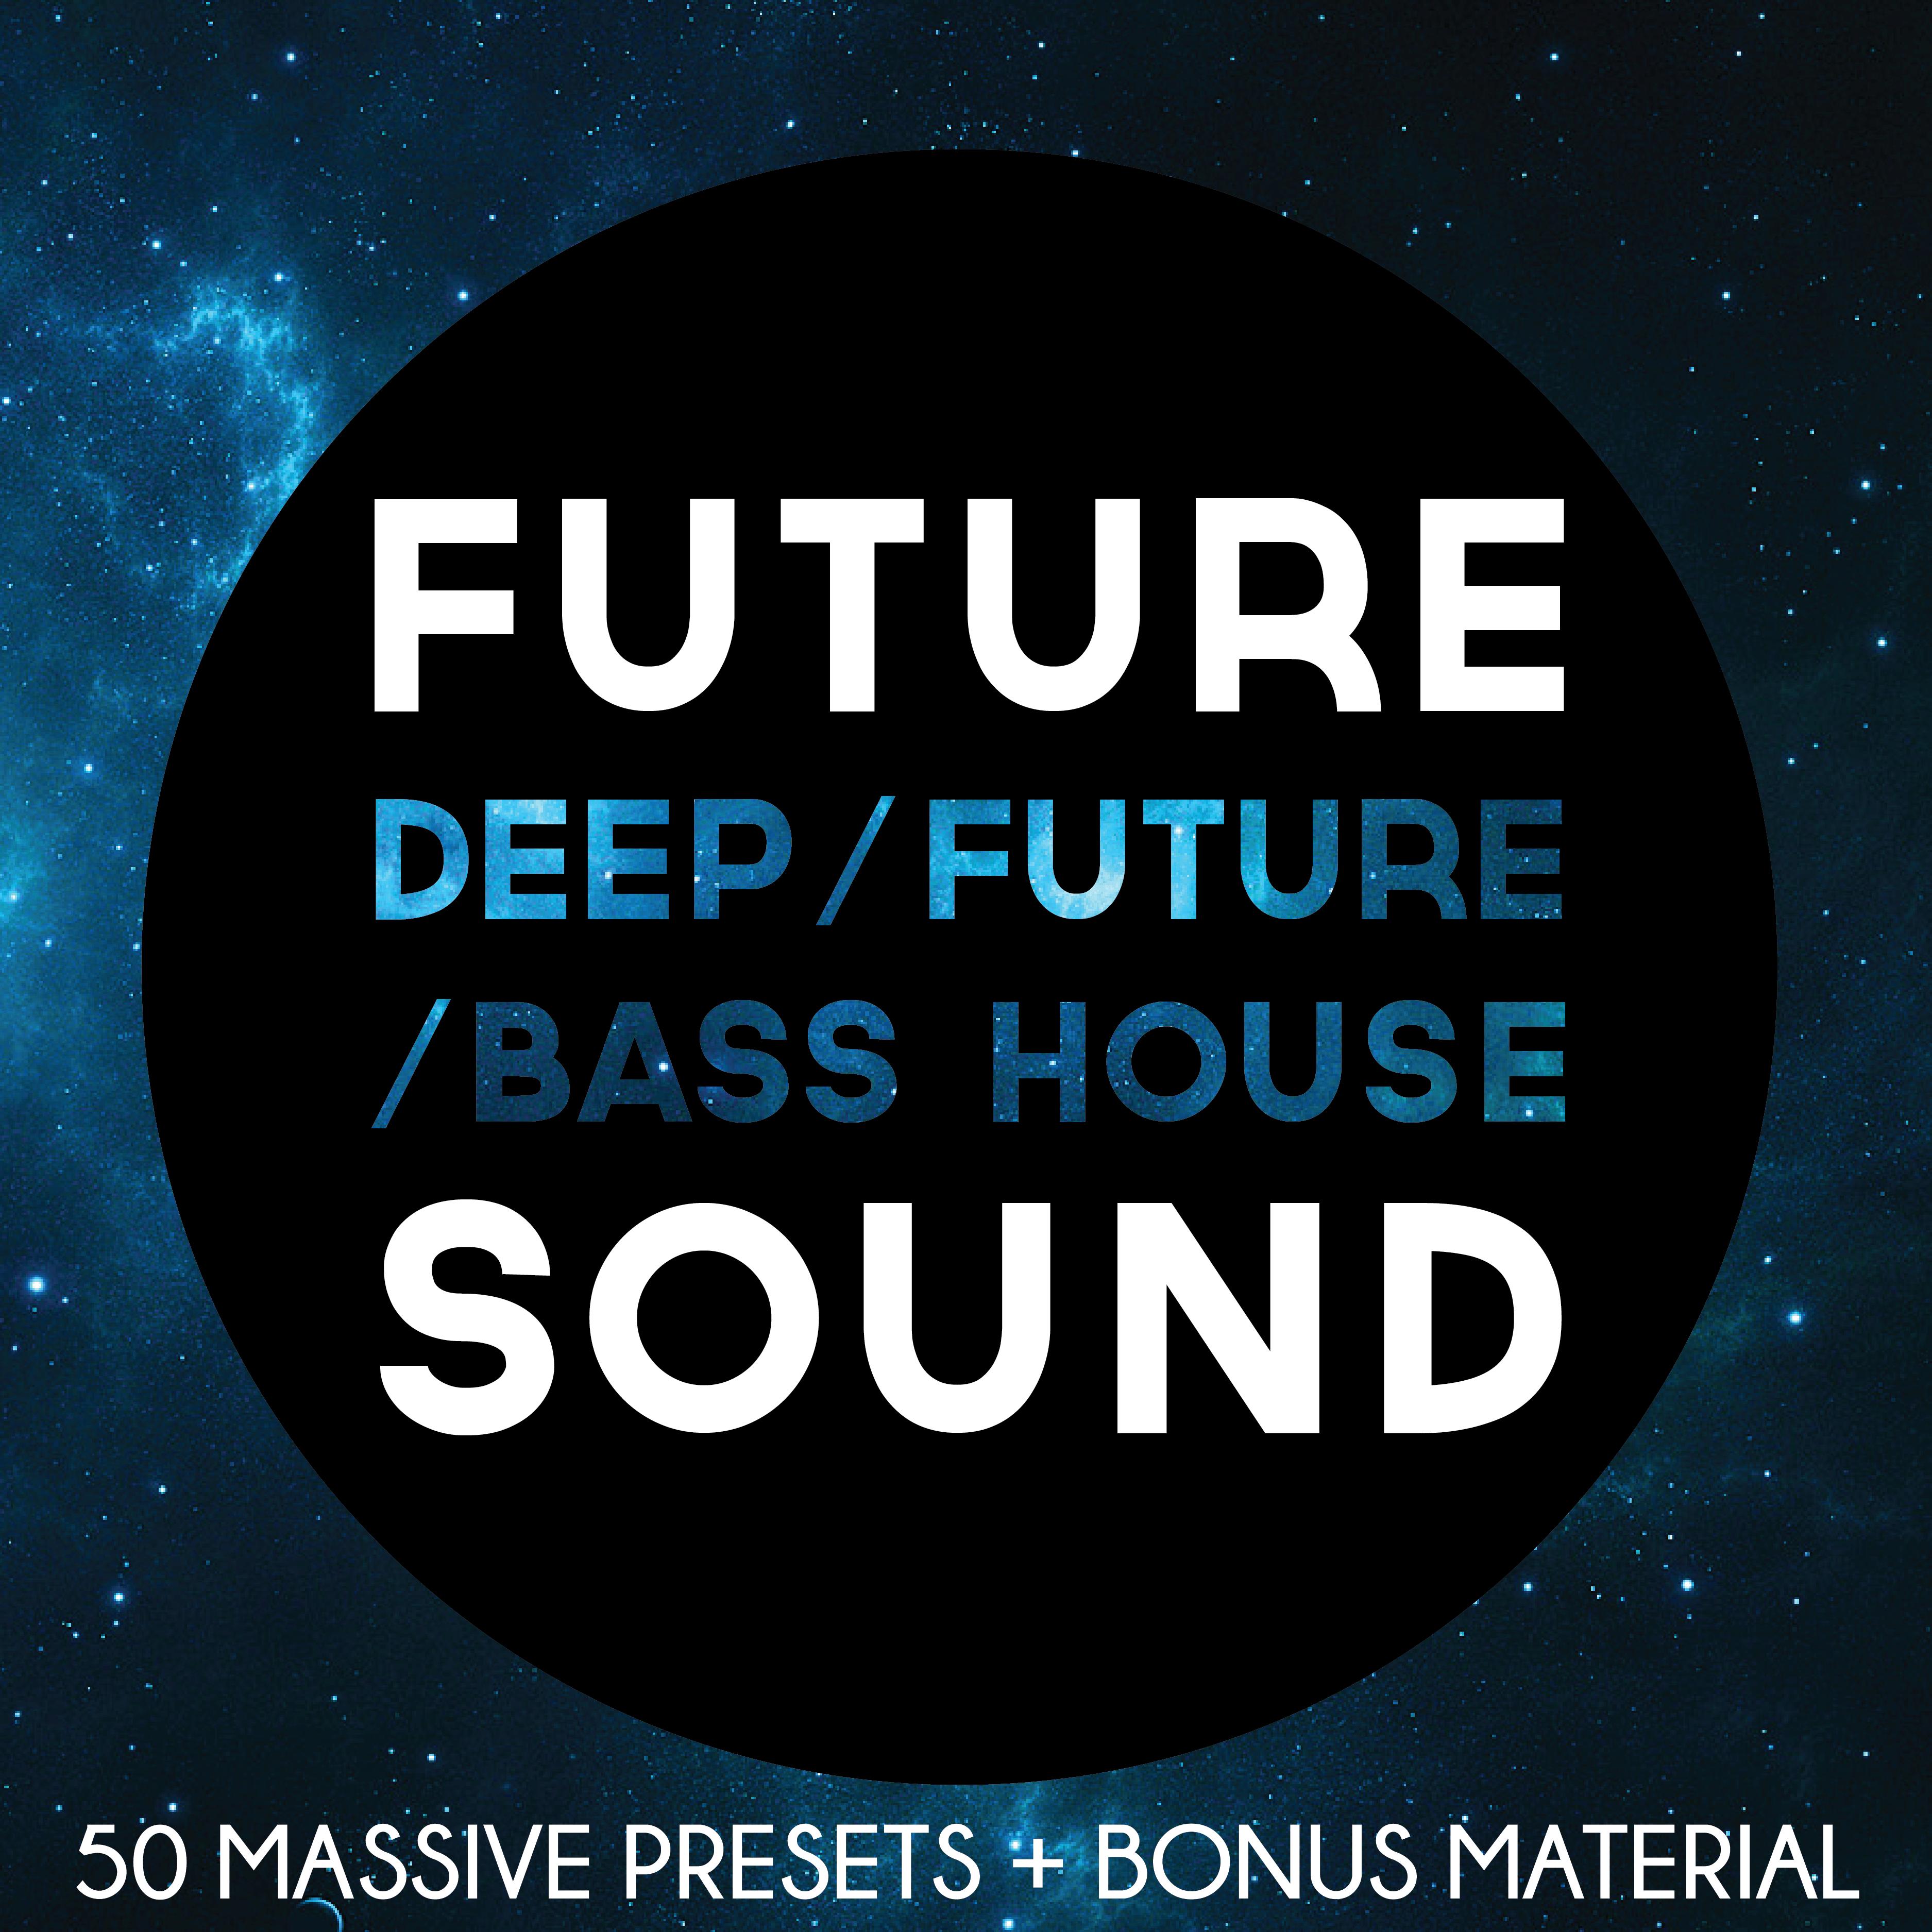 Future Sound - Deep/Future/Bass House Presets for Massive